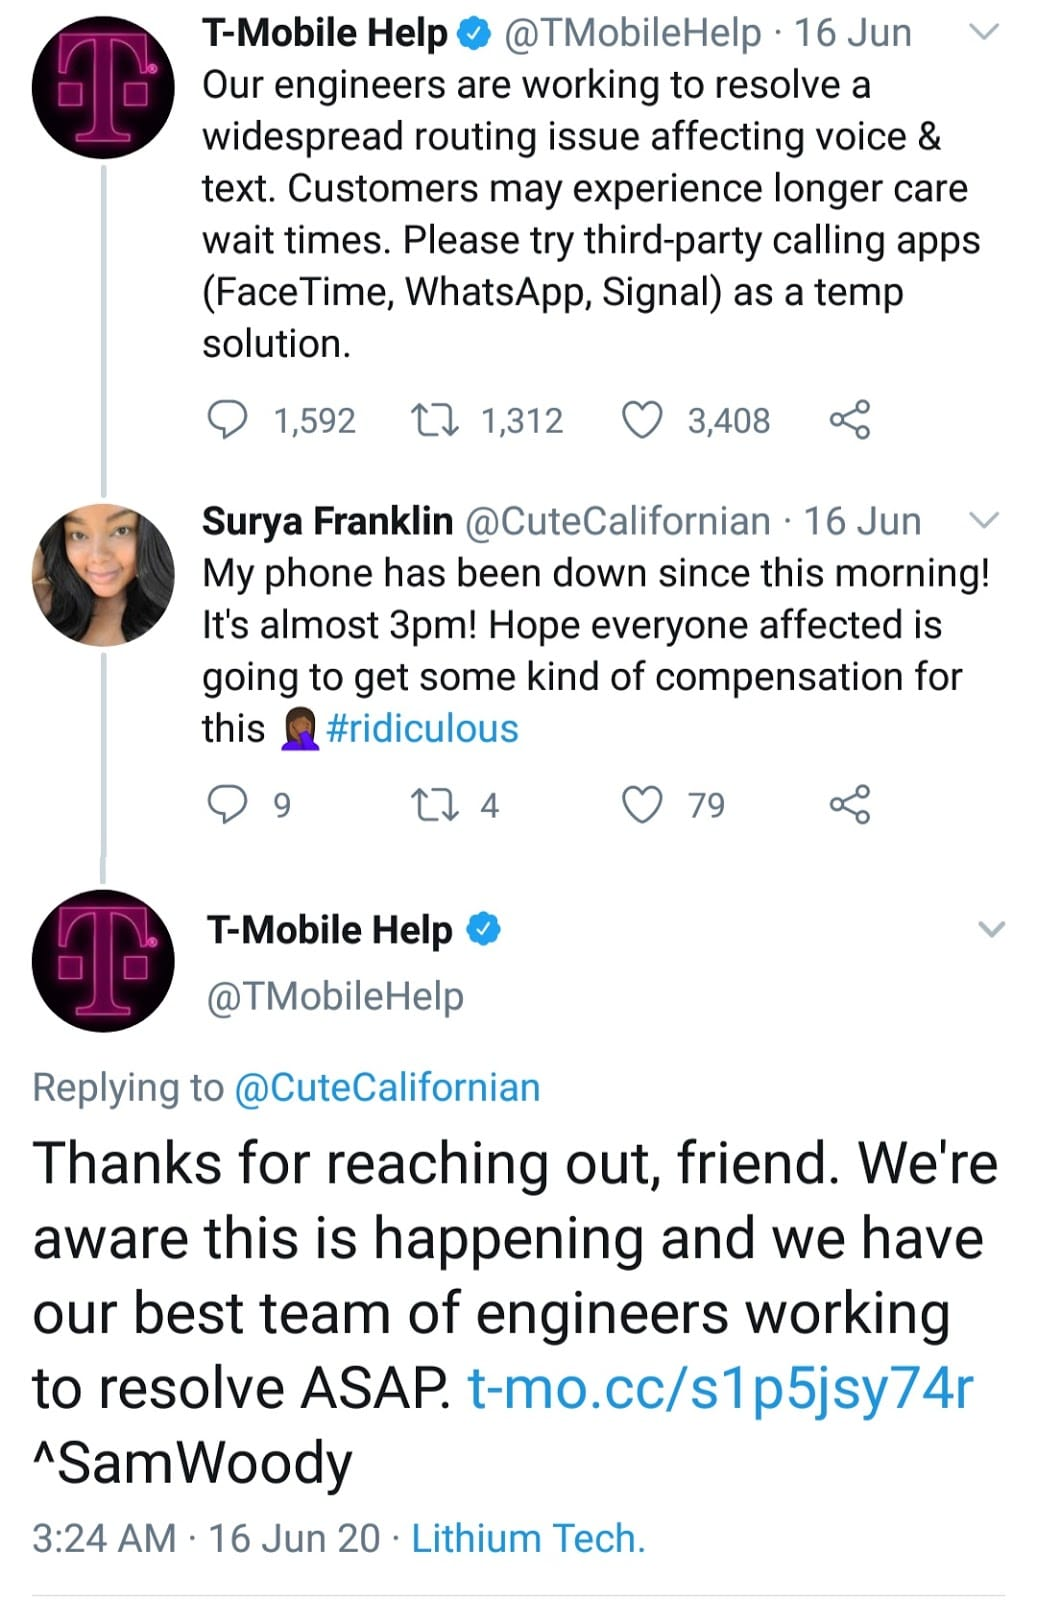 t-mobile-help-twitter